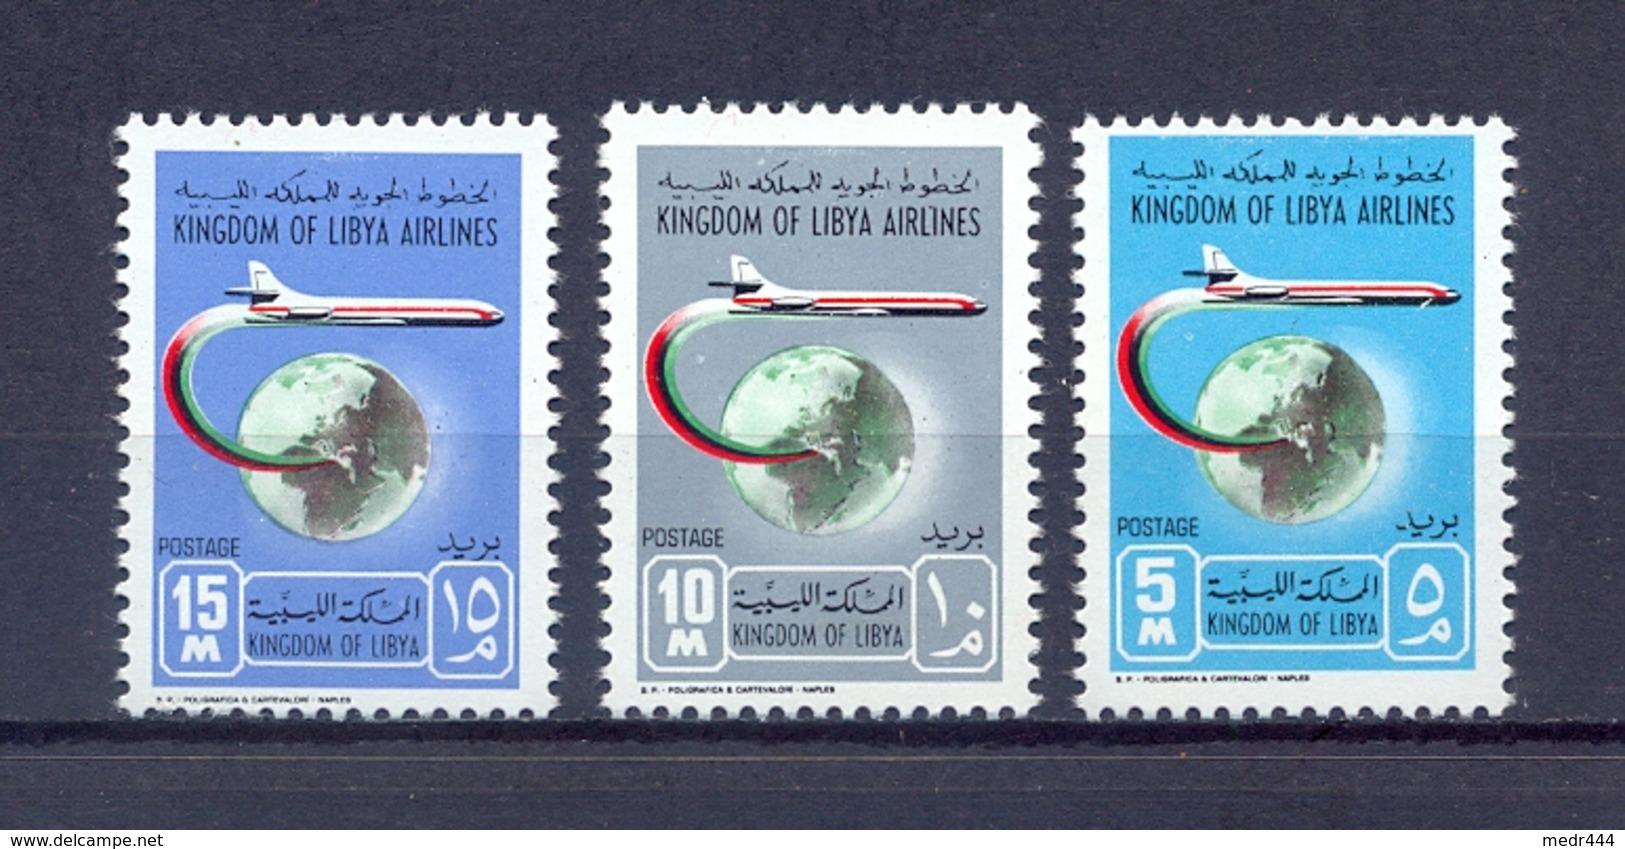 Libya 1966 - Kingdom Of Libya - 1st Anniversary Of Kingdom Libyan Airlines - Complete Set - Stamps 3v - MNH** - Libia